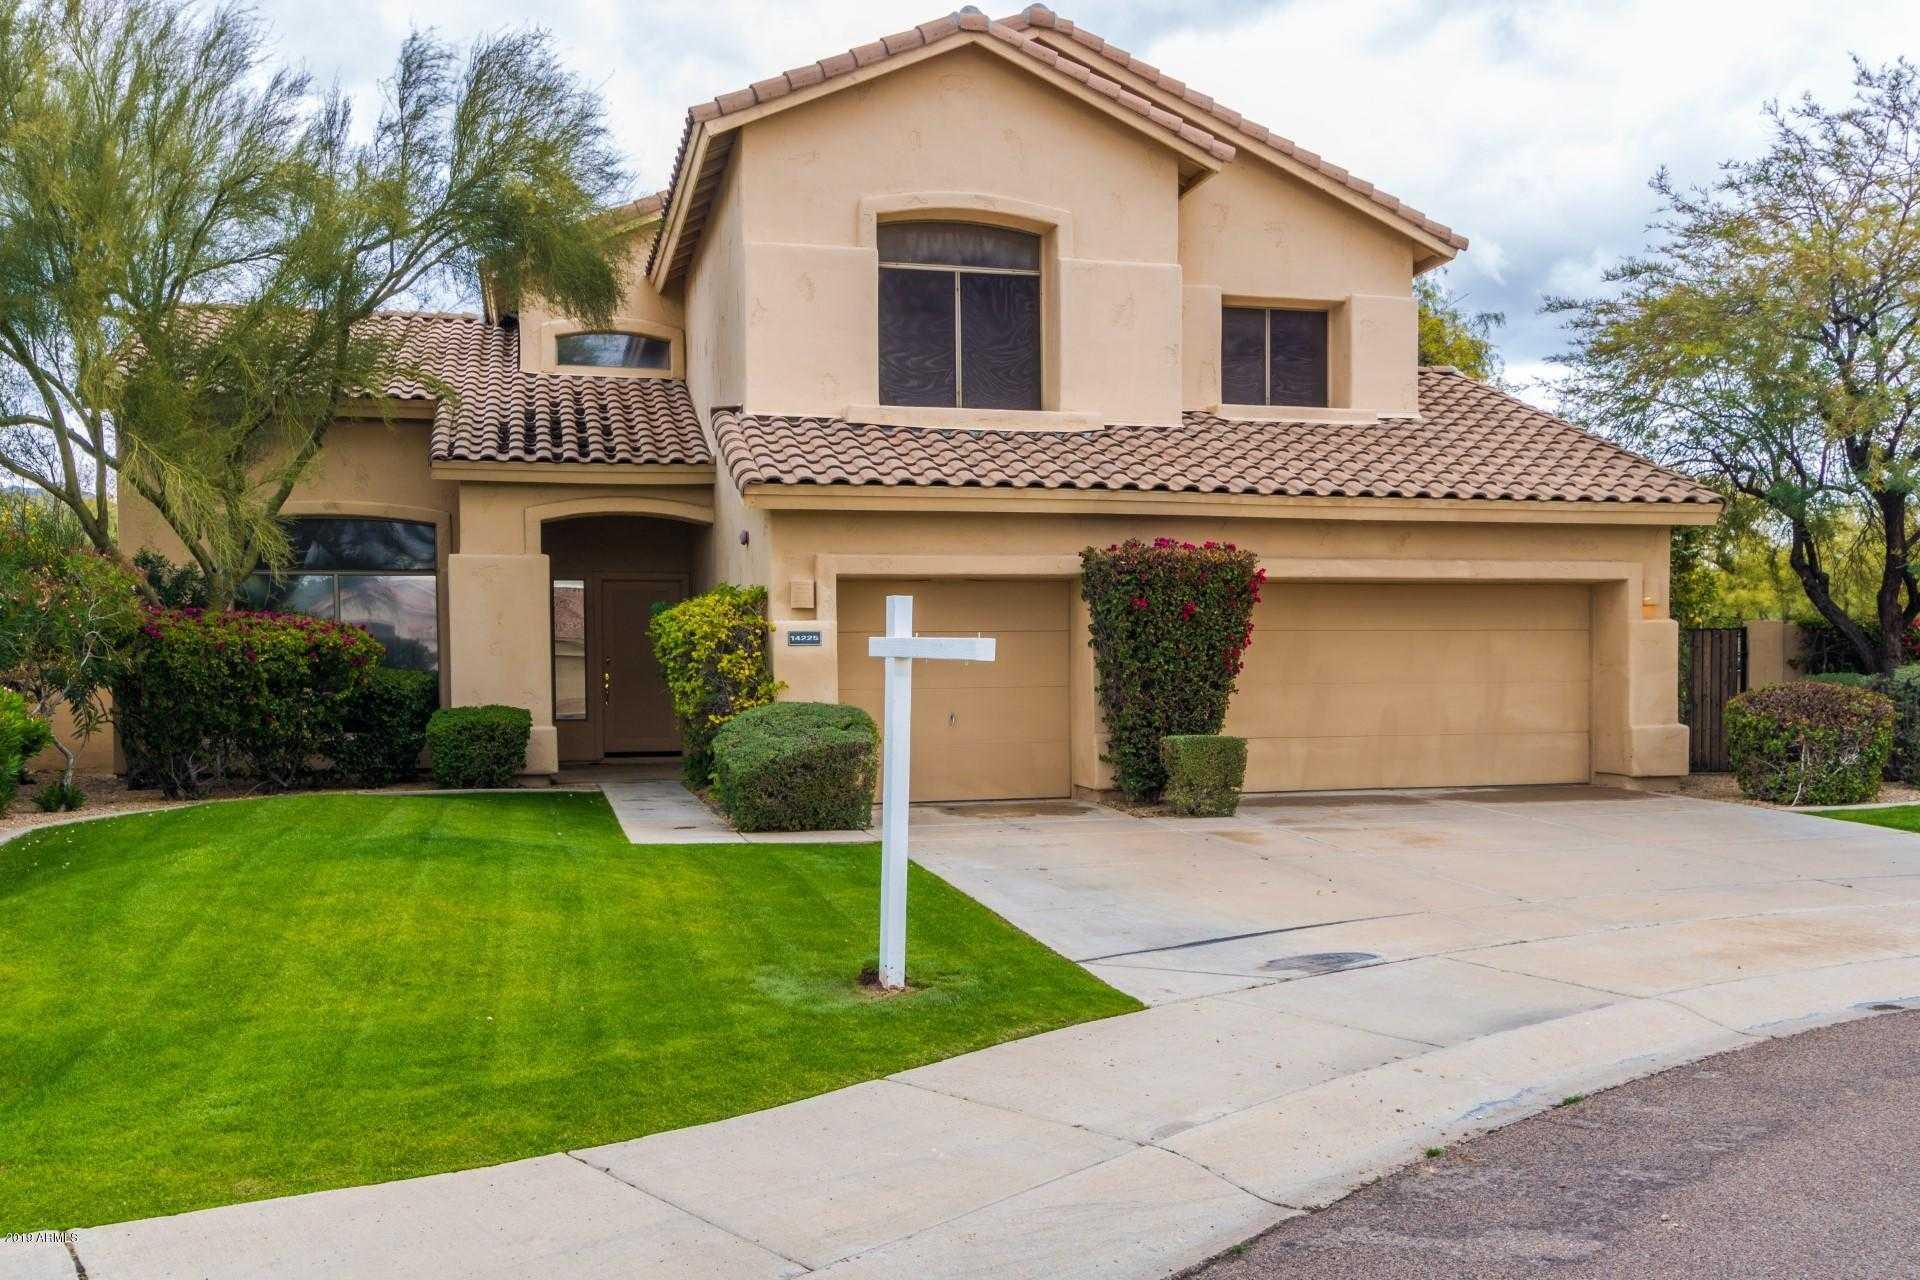 $500,000 - 3Br/3Ba - Home for Sale in Costa Verde, Scottsdale